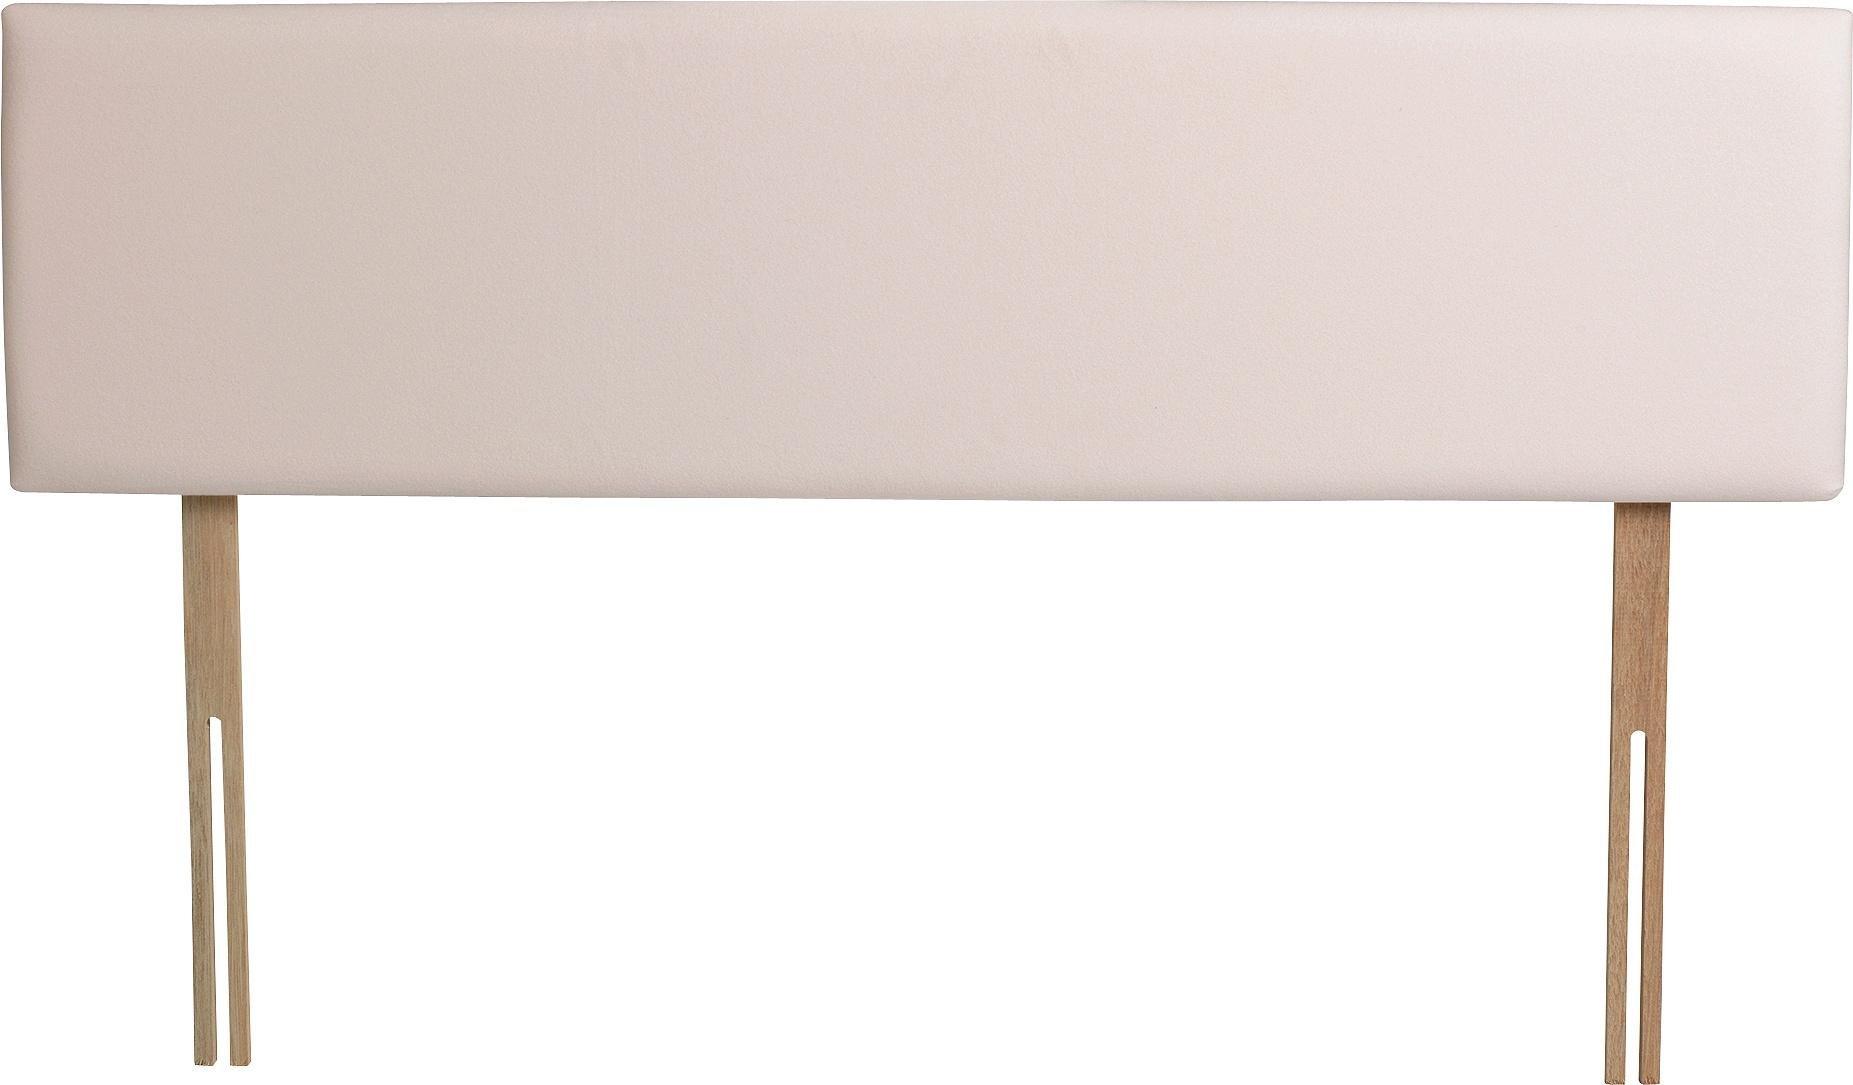 Airsprung Hollis Double Headboard - Cream